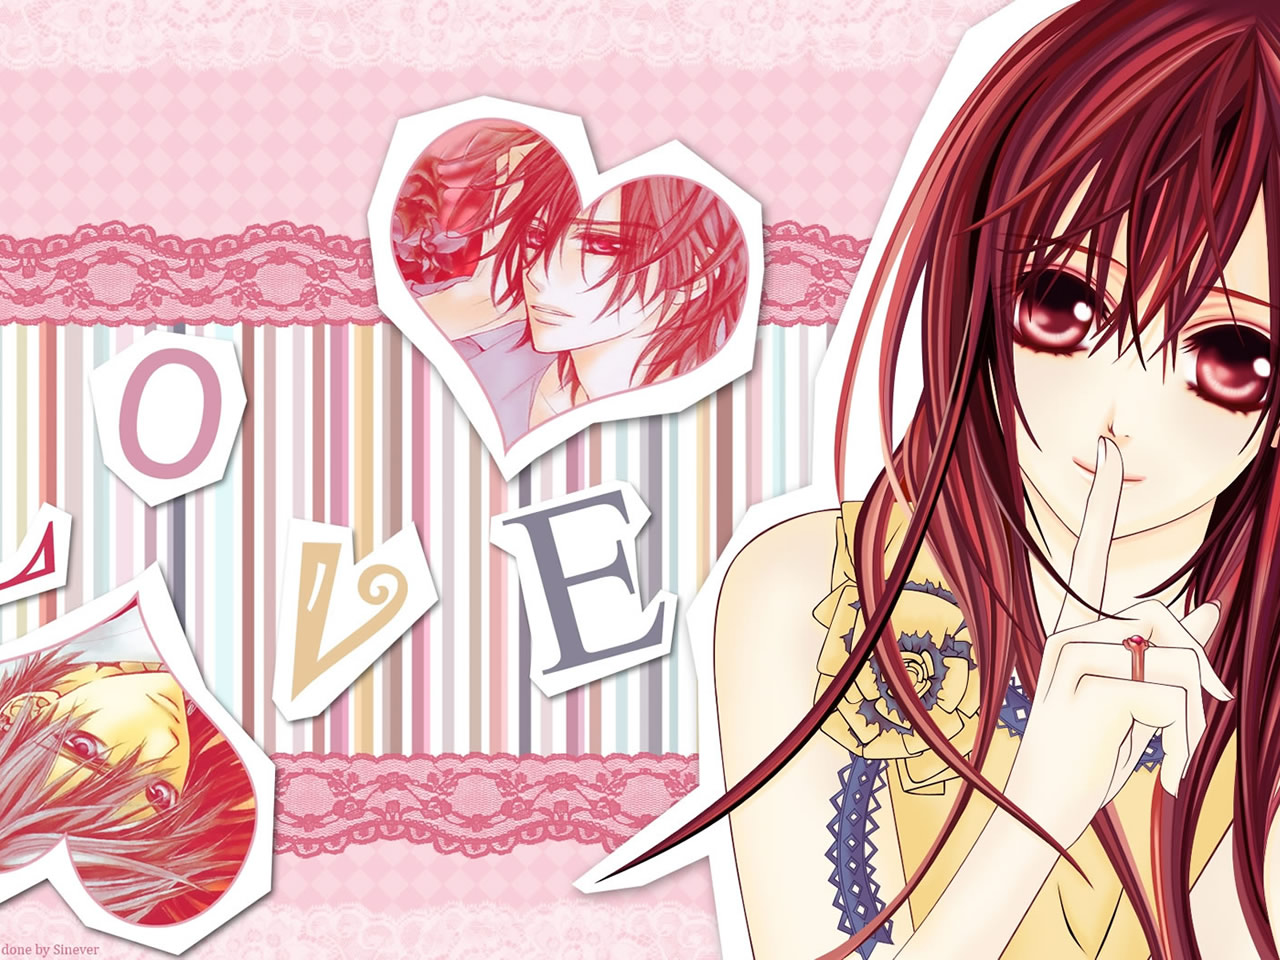 Love Anime Background - Love Anime Background